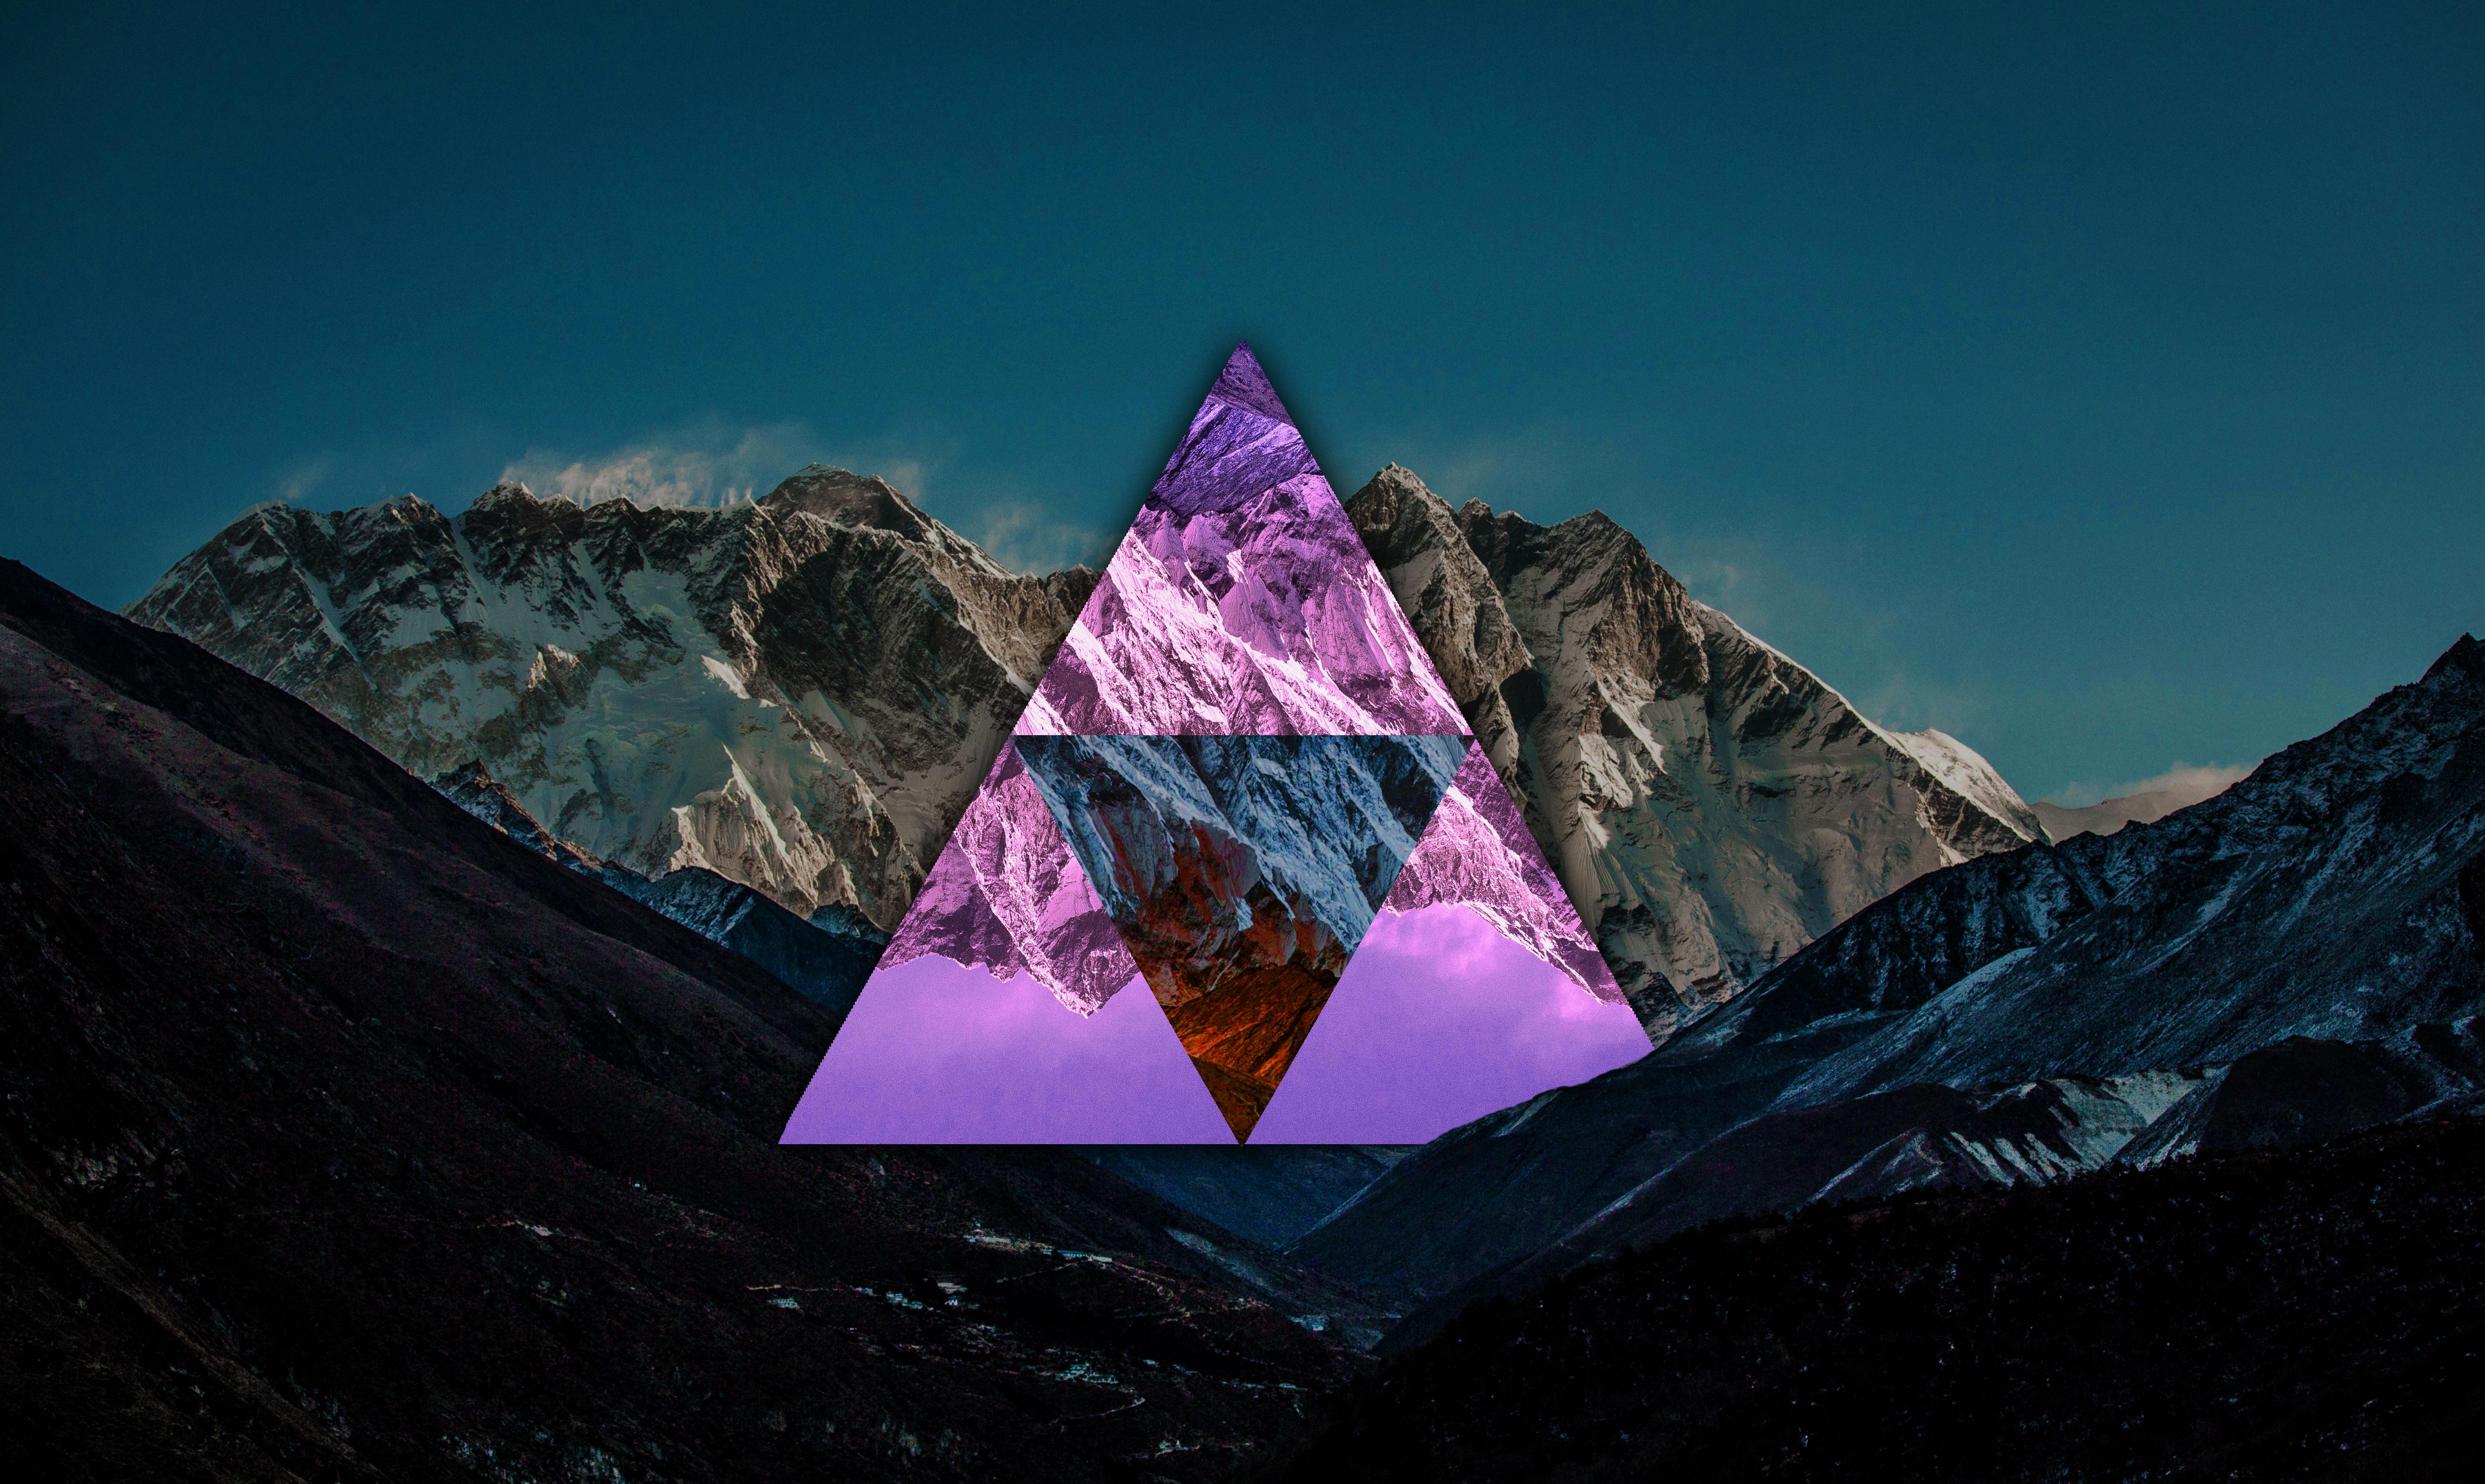 Beautiful Wallpaper Mountain Triangle - mountain-pass-triangle-minimalism-clear-sky-1145890  2018_40853.jpg